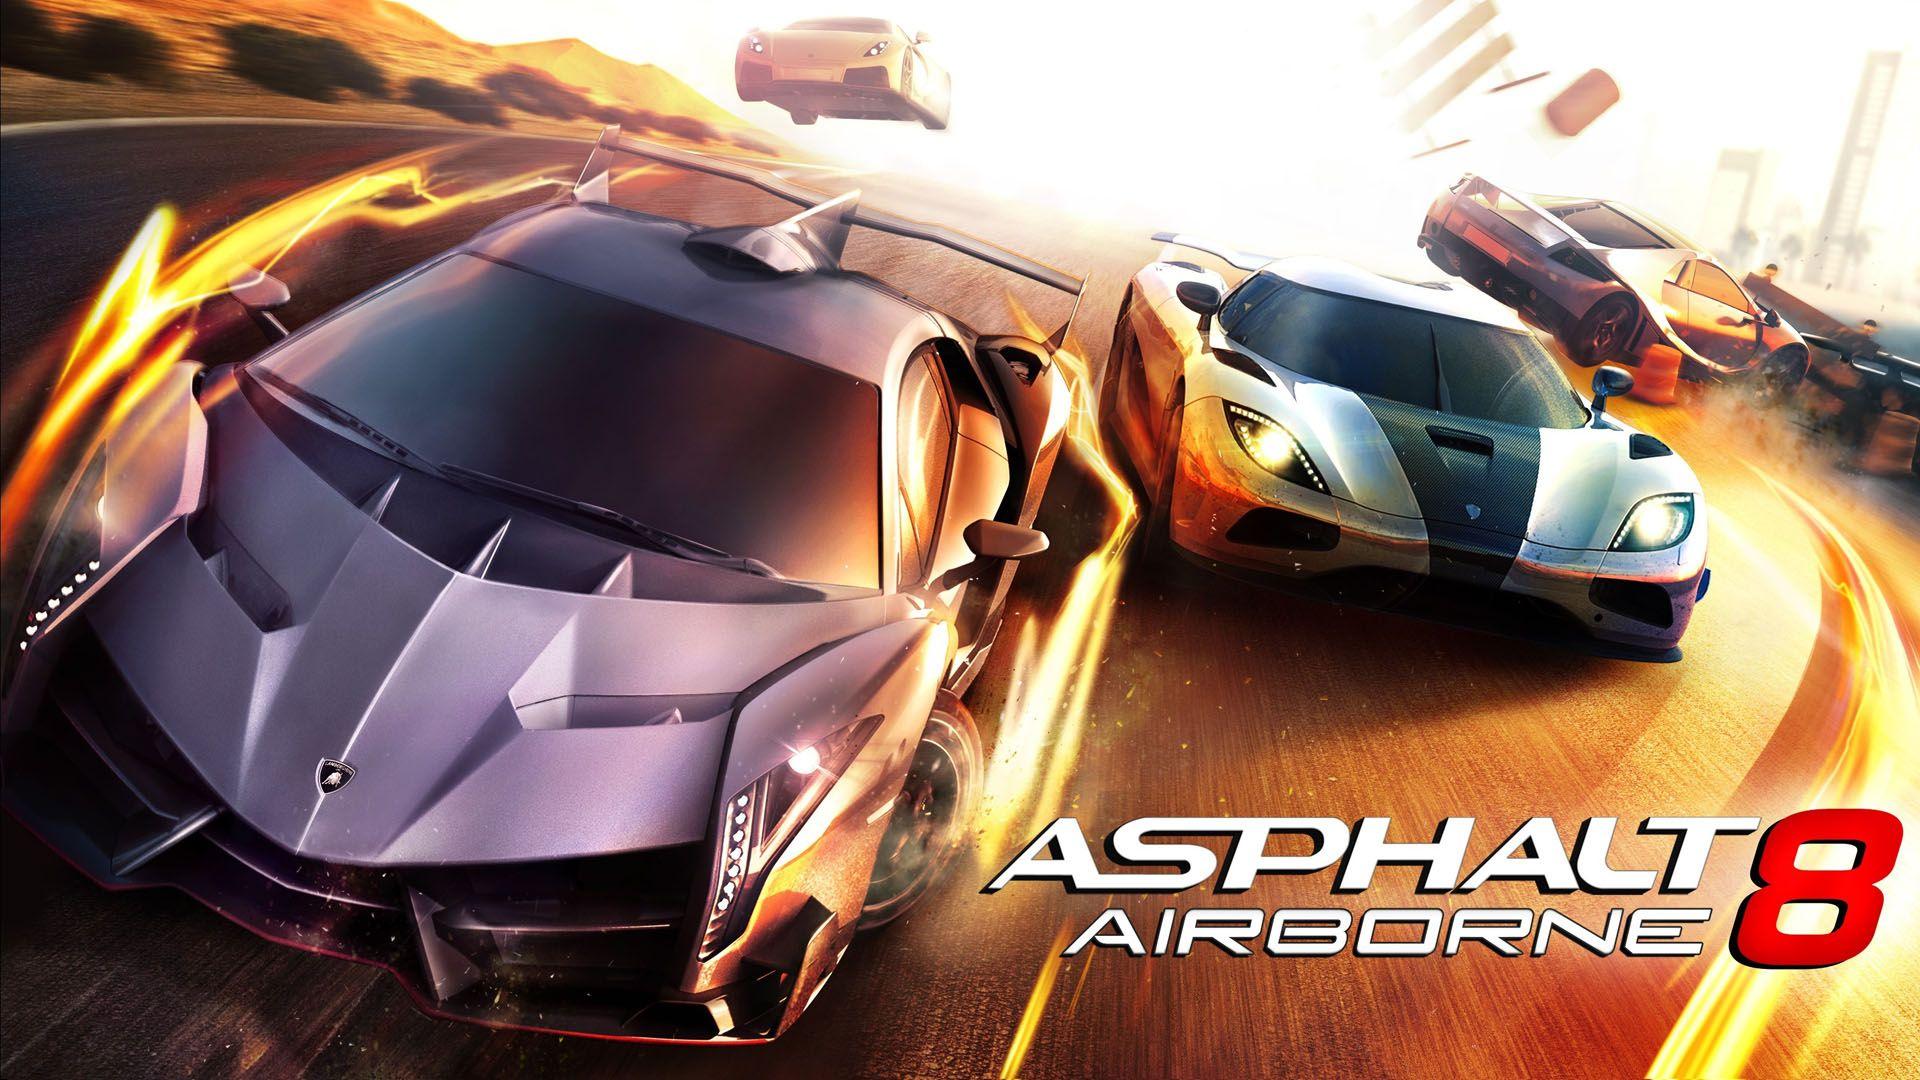 asphalt 8 for pc windows 7 free download full version